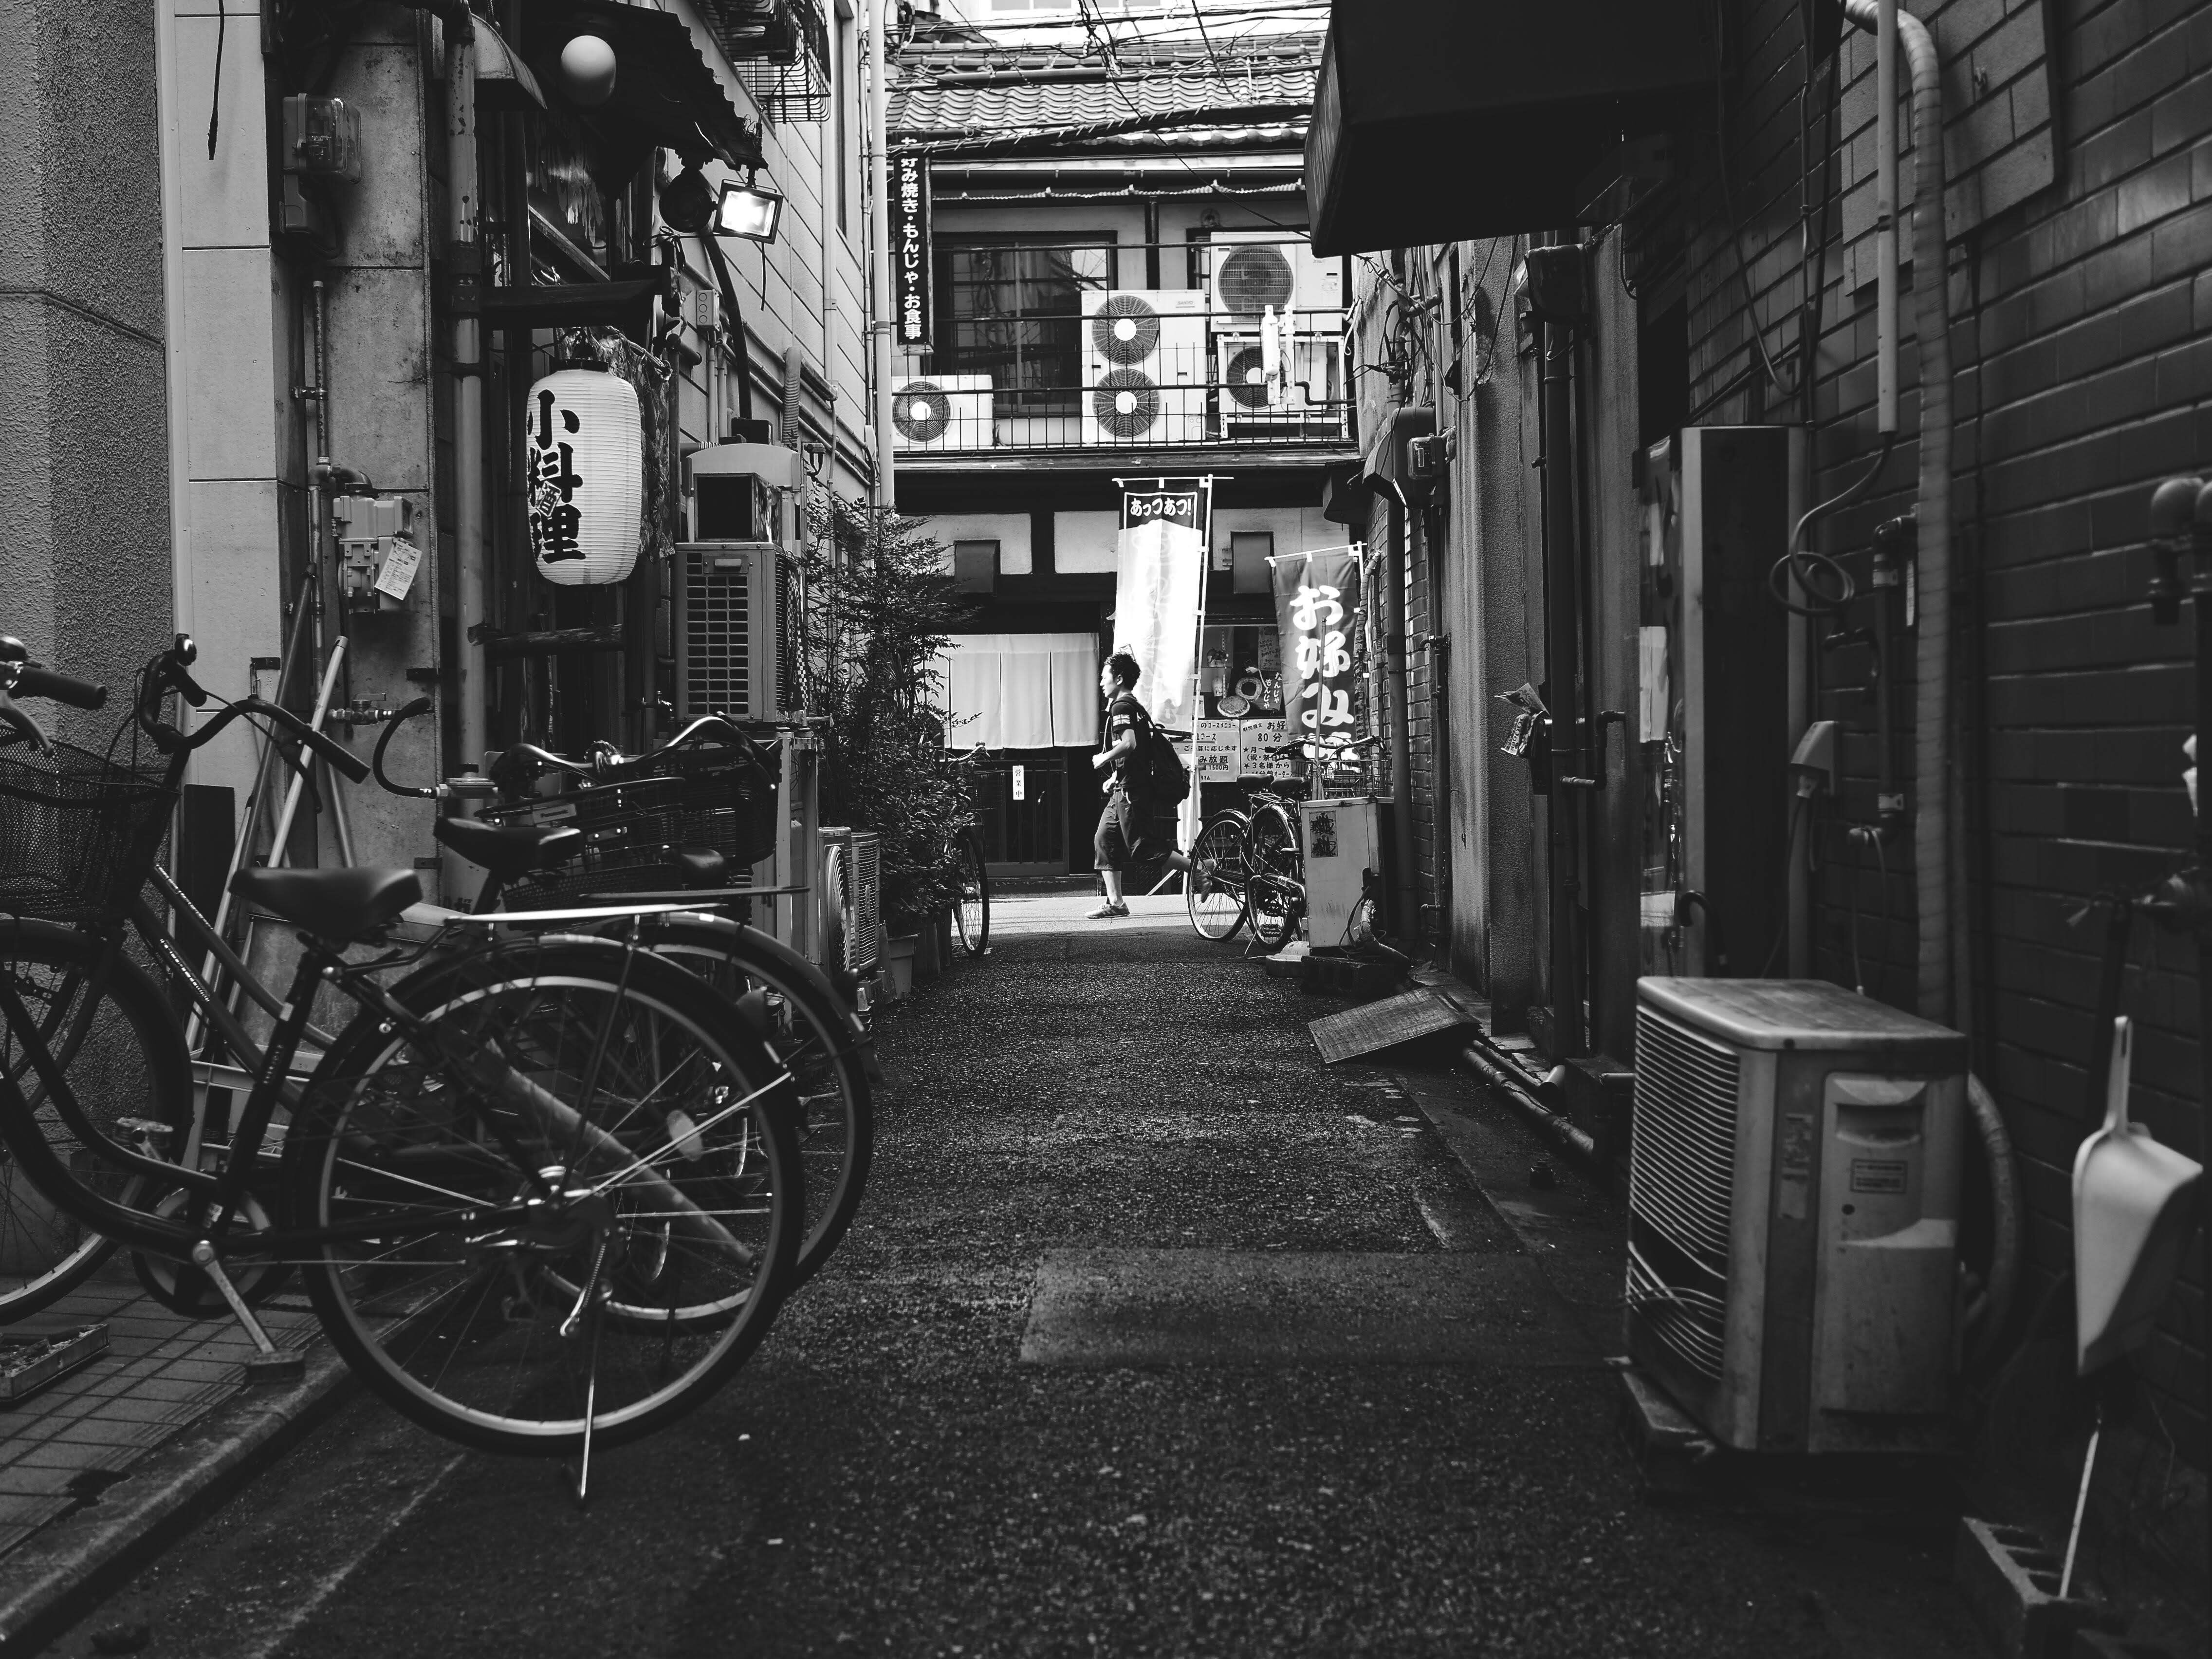 f:id:yuuki89:20190222230855j:image